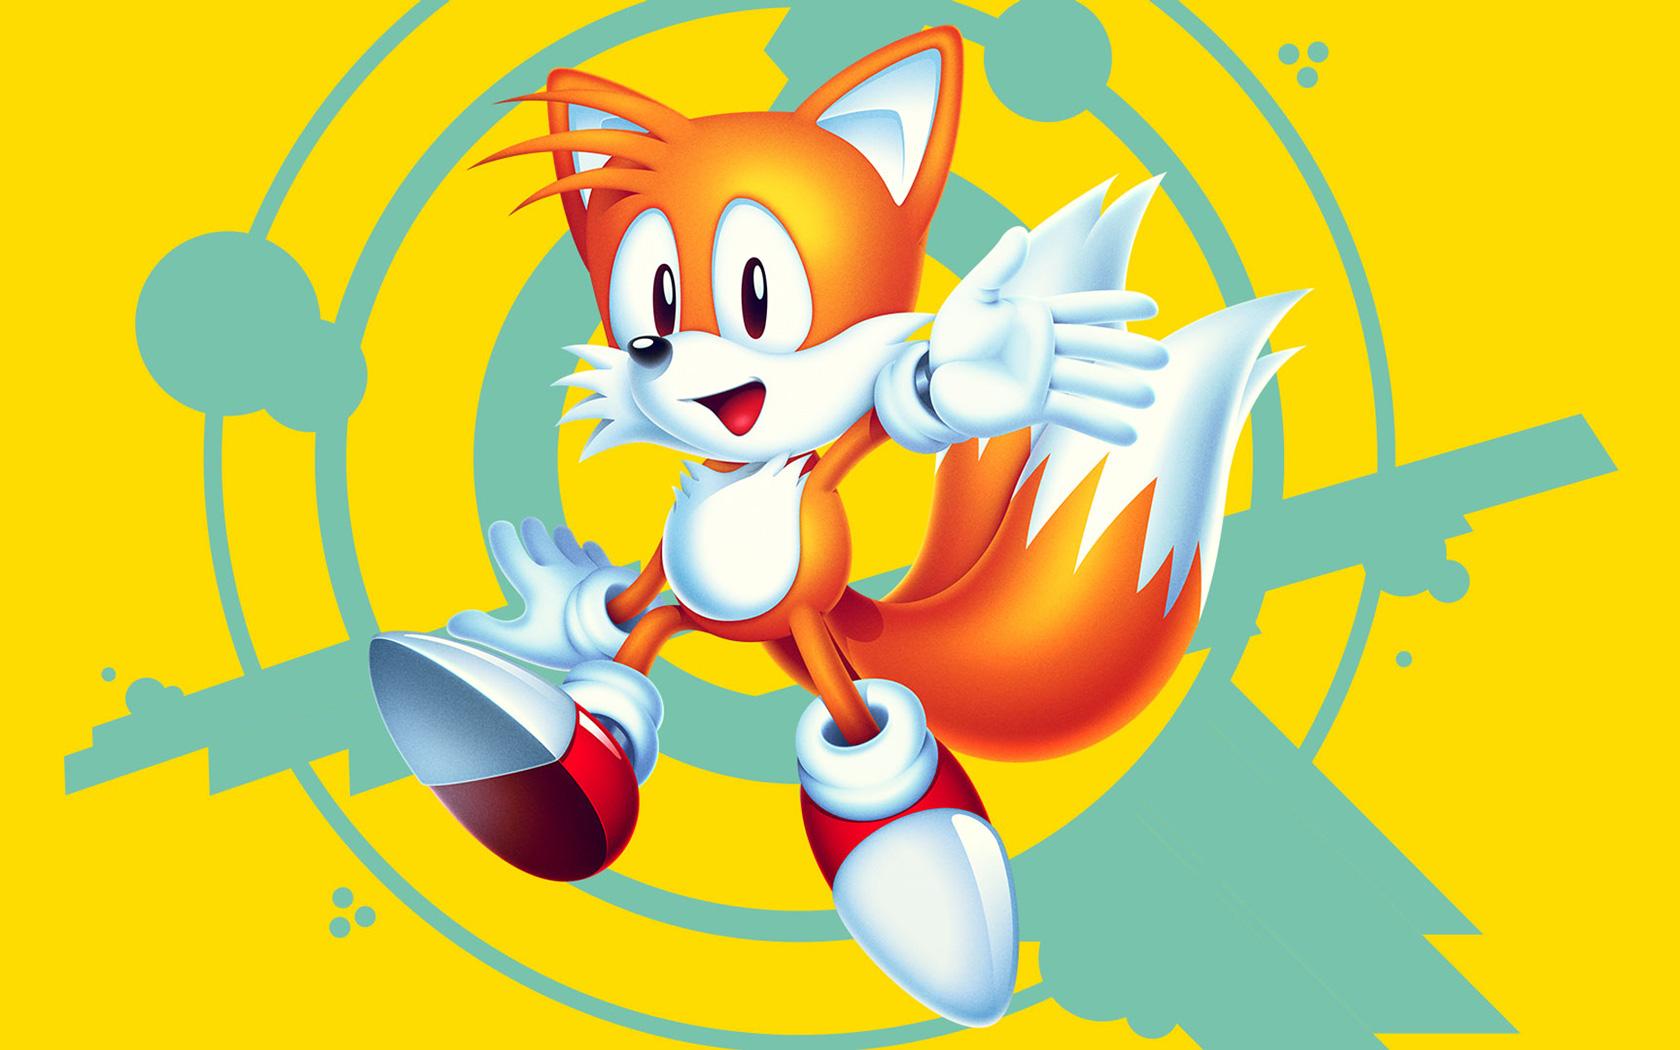 Free Sonic Mania Wallpaper in 1680x1050